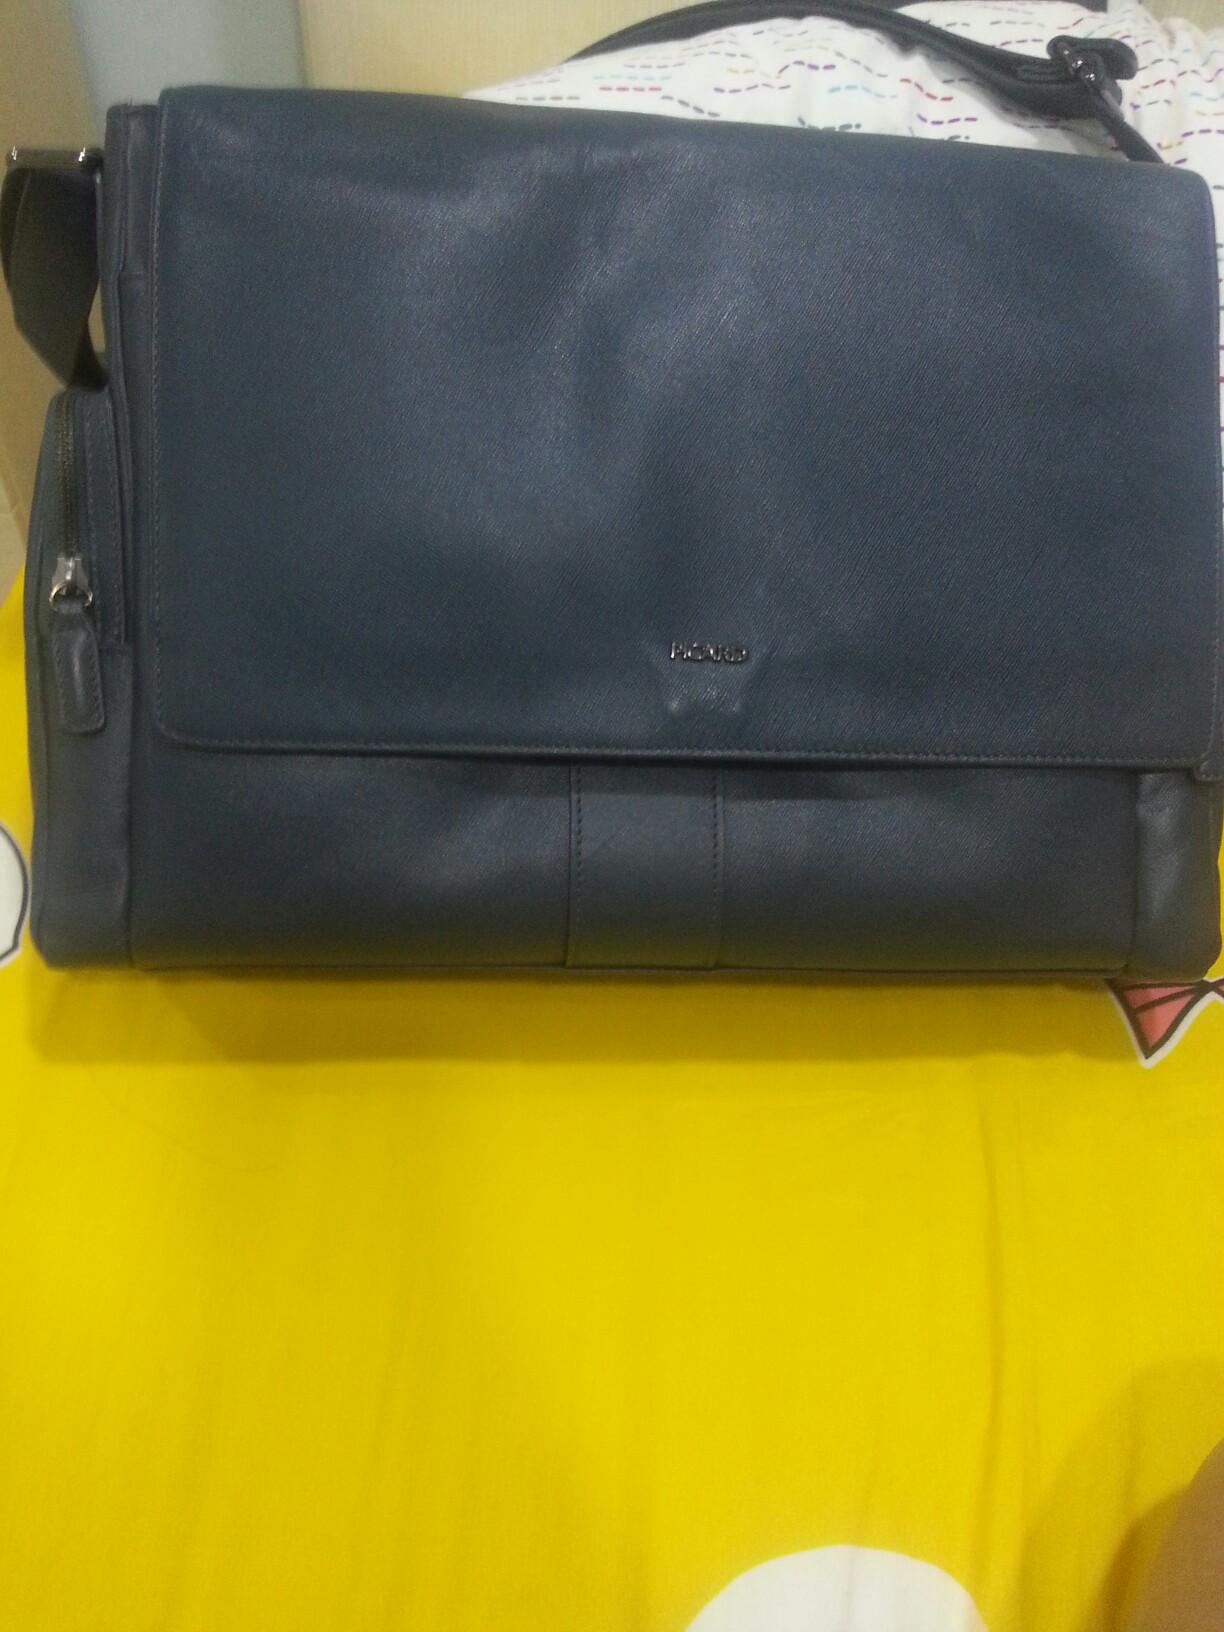 6e865d1502c93 Picard genuine leather sling bag.